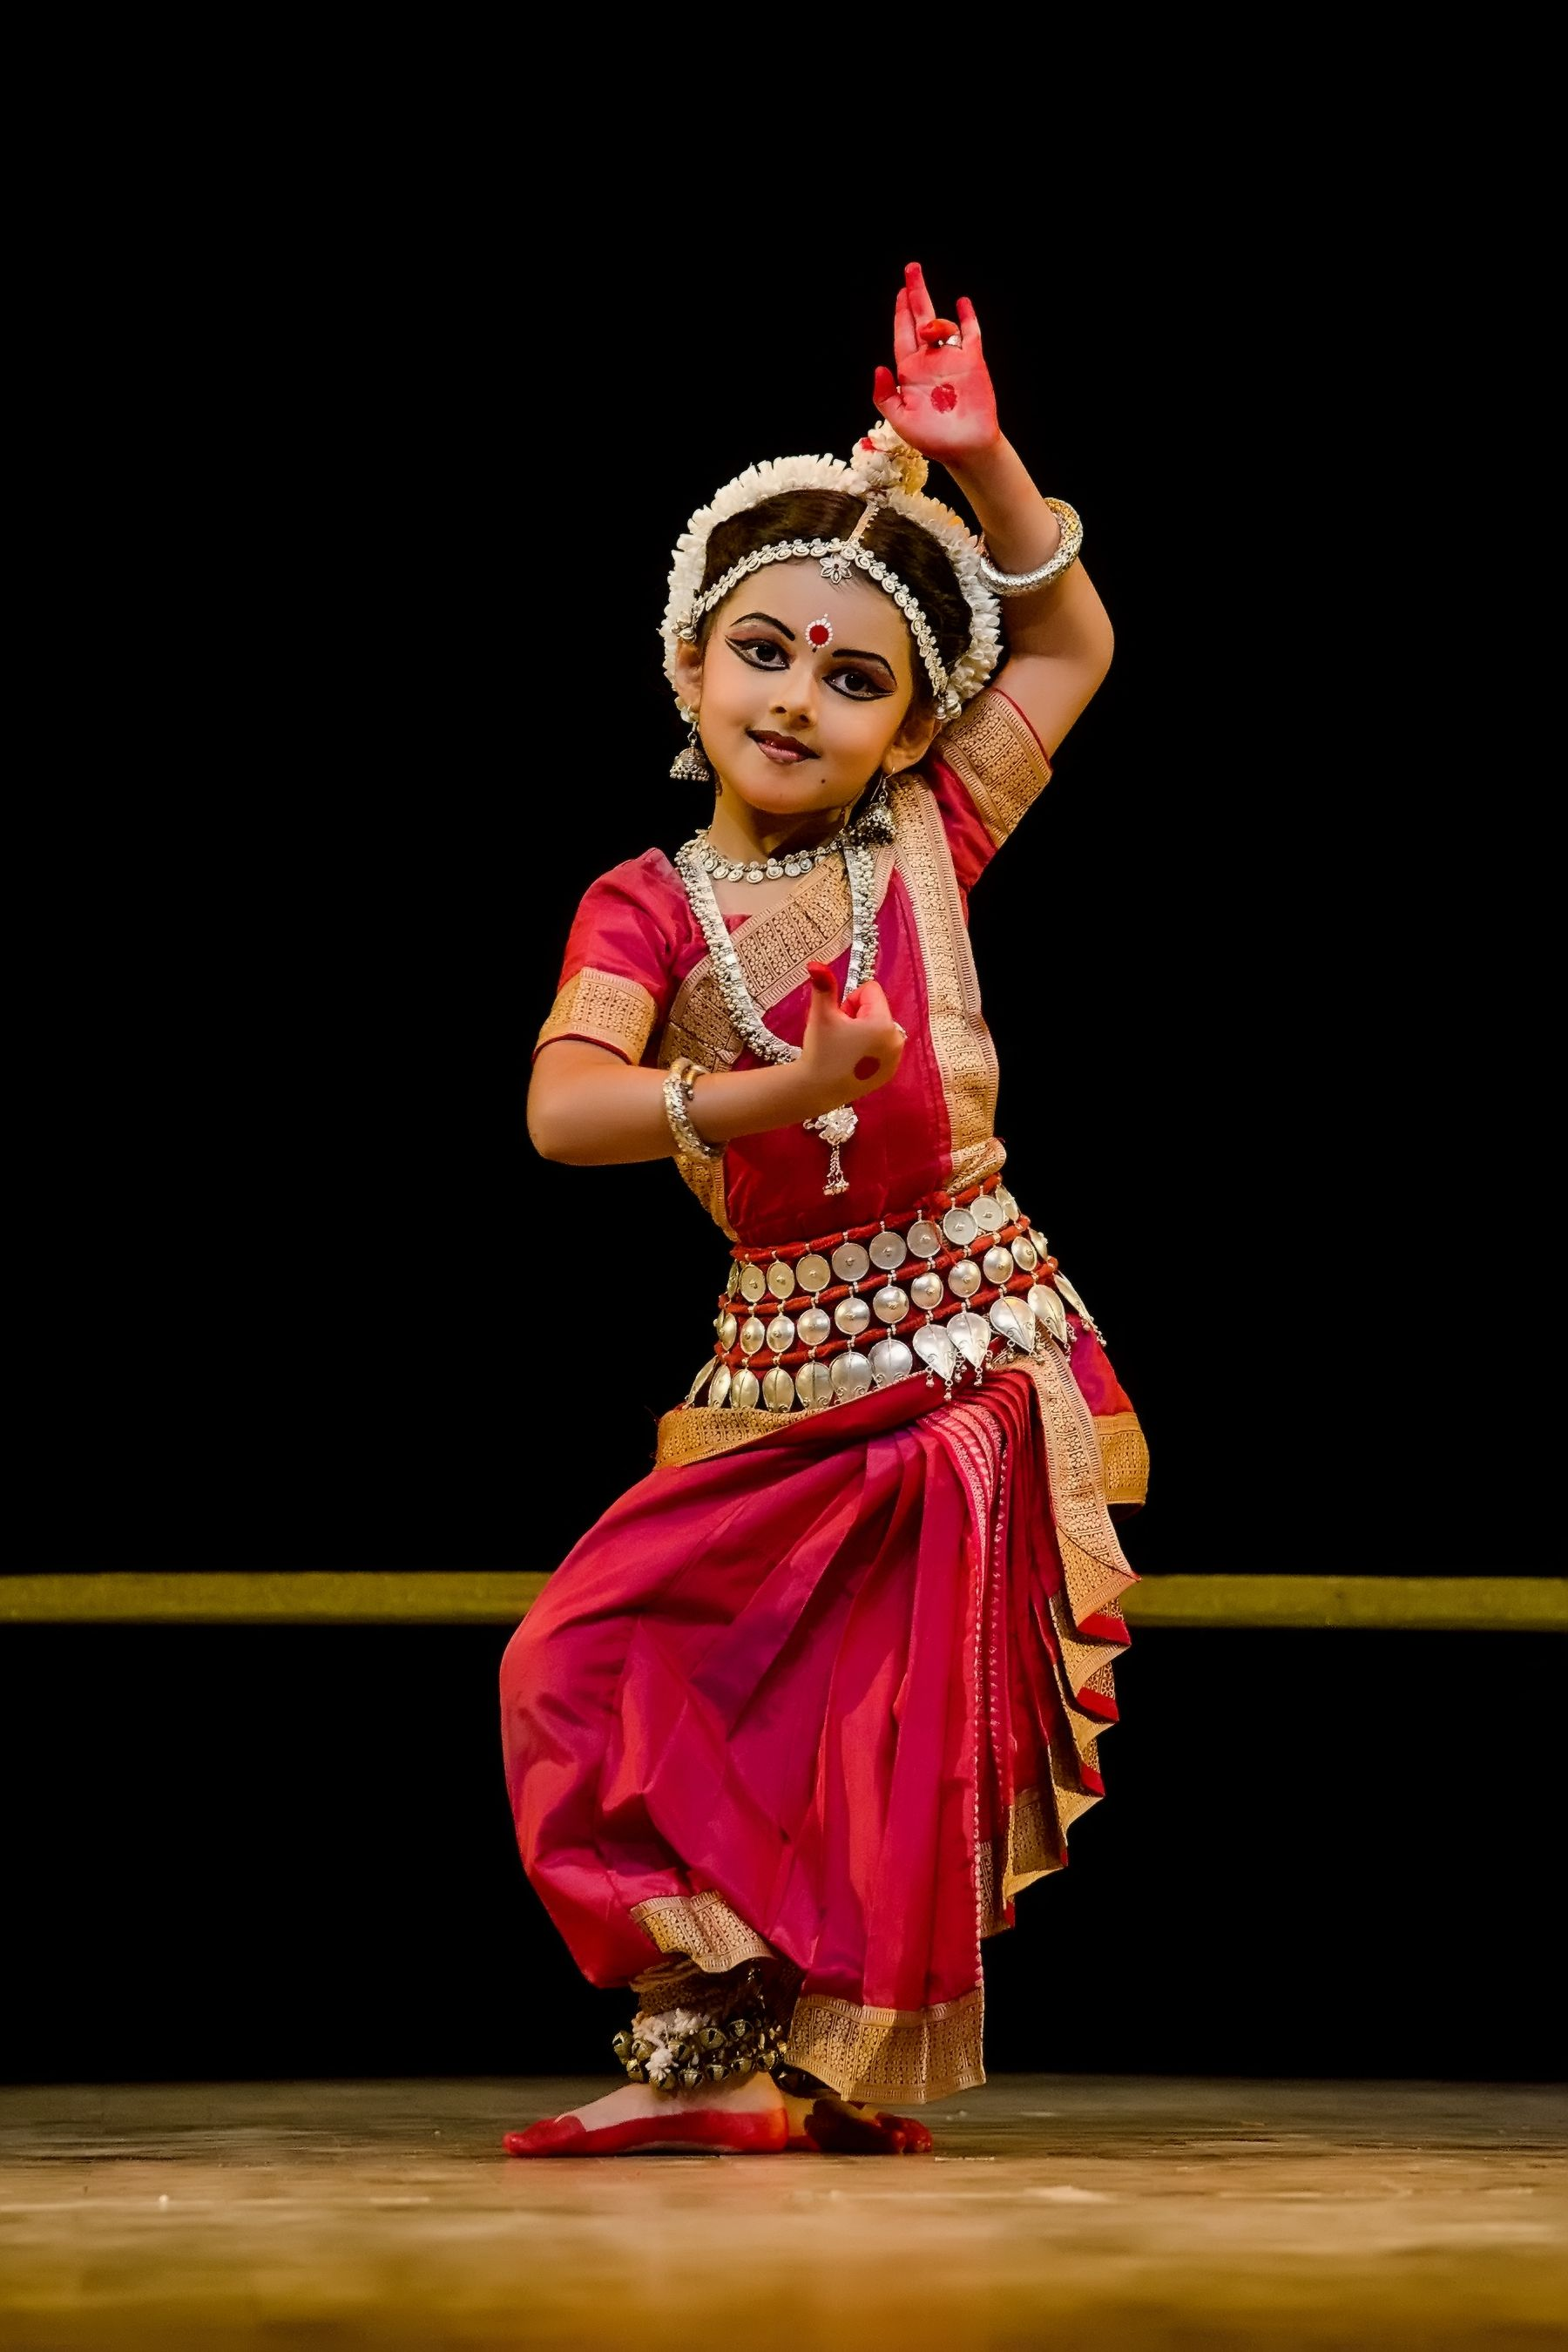 Shrinika_performing_Abhinaya_(Kede_Chhanda_Janilu_Tuhi).jpg (1800 ...